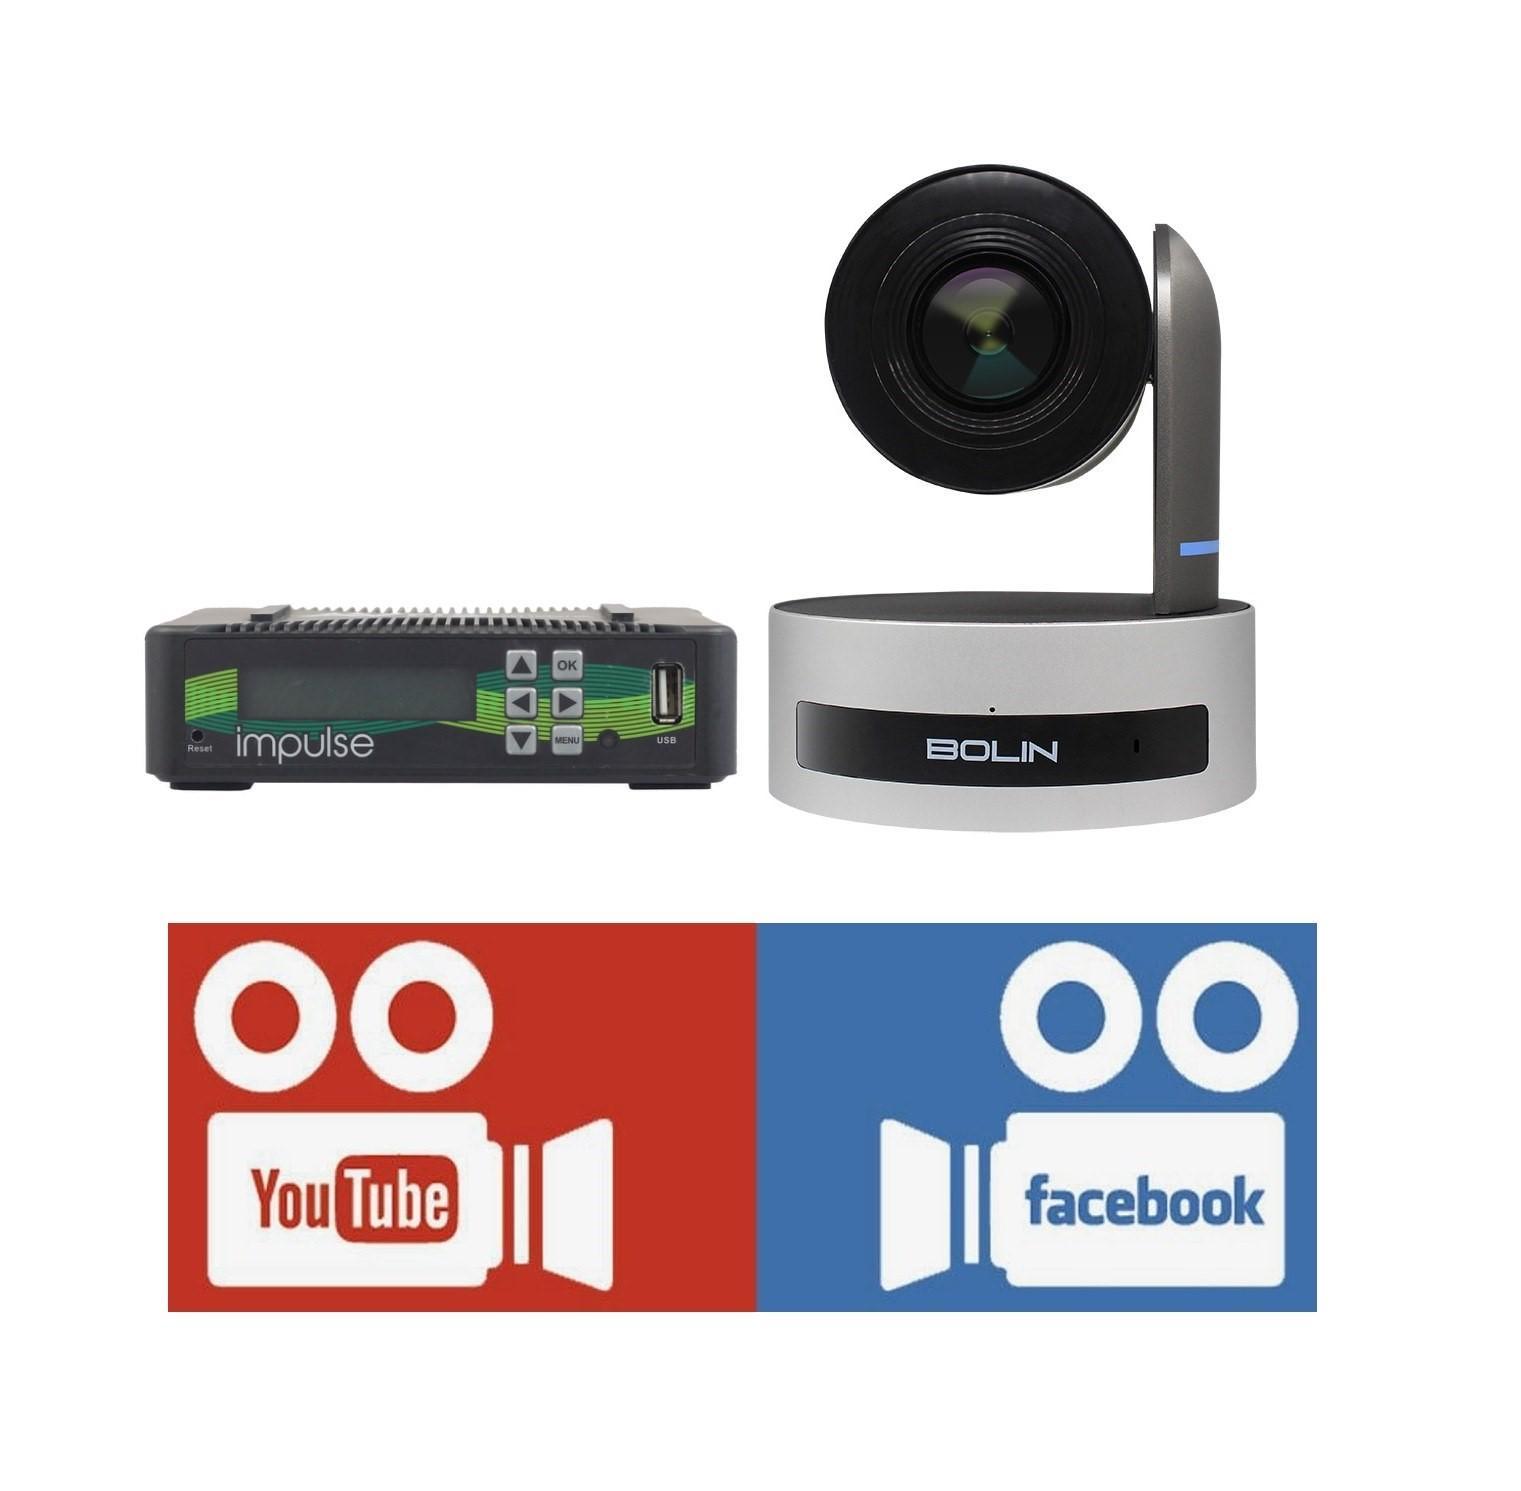 Broadcast Facebook, YouTube Live video via Bolin PTZ Camera and